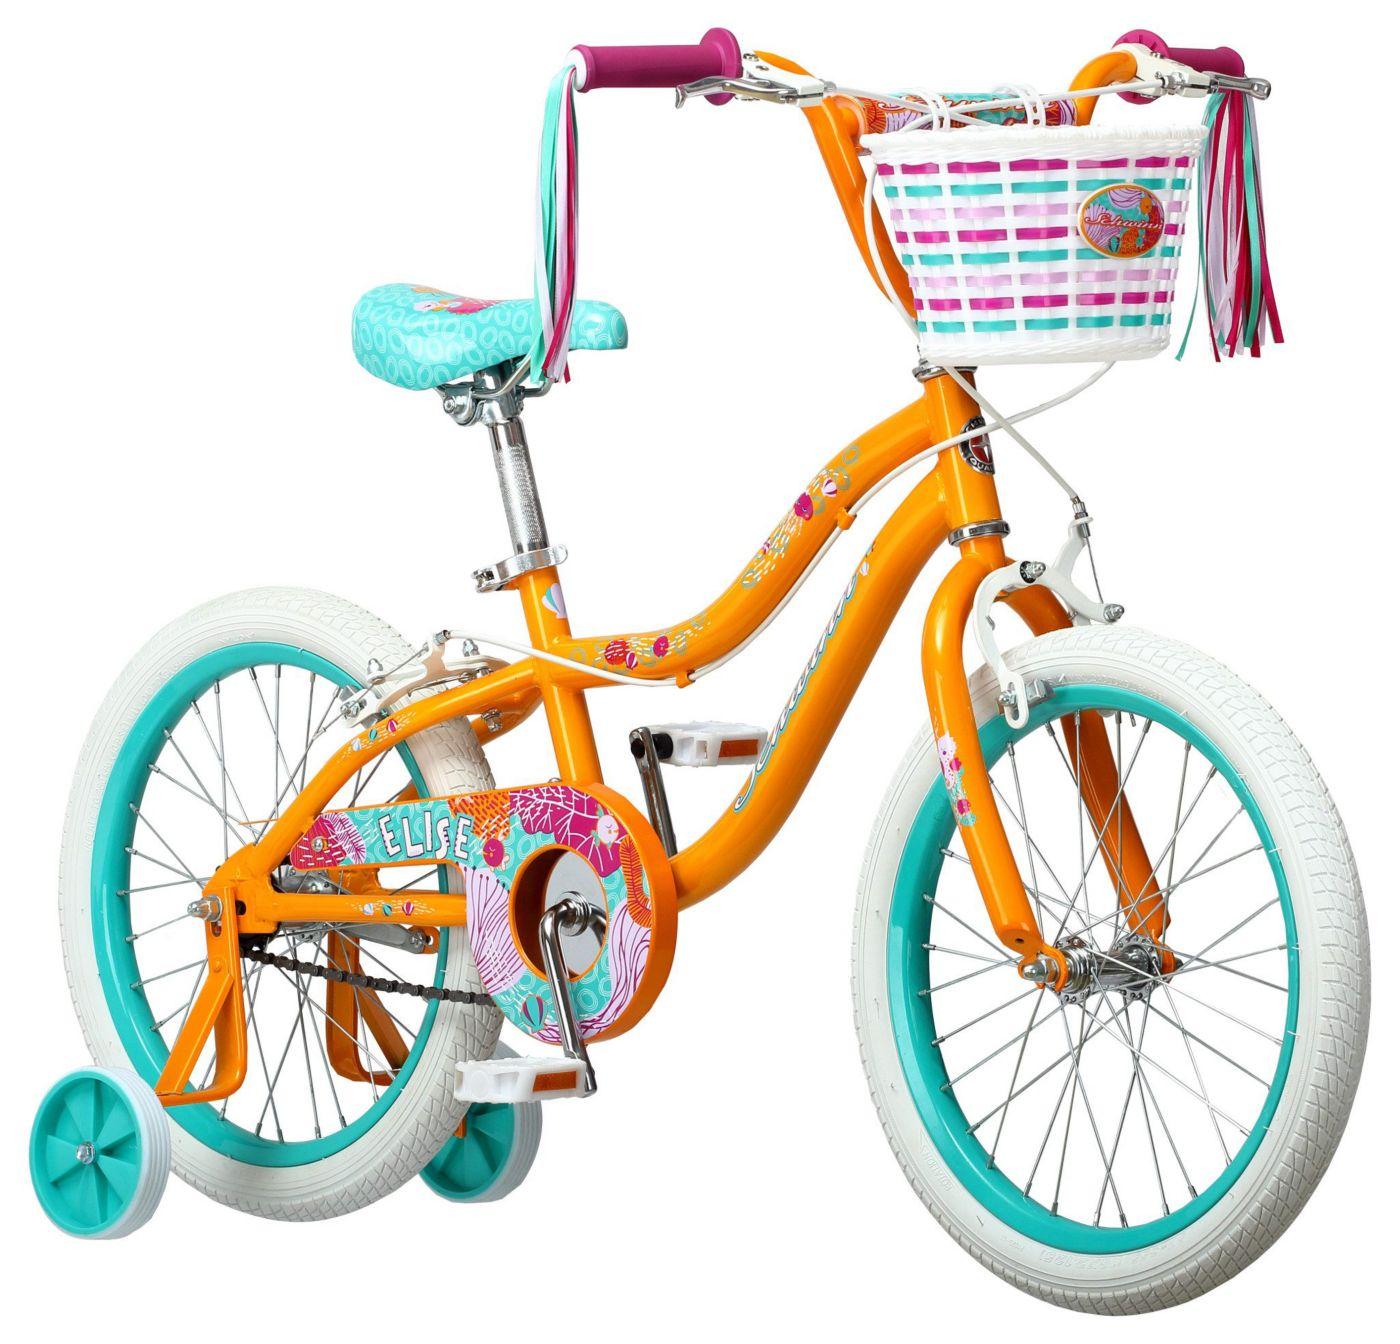 Schwinn Girls' Elise 18'' Bike